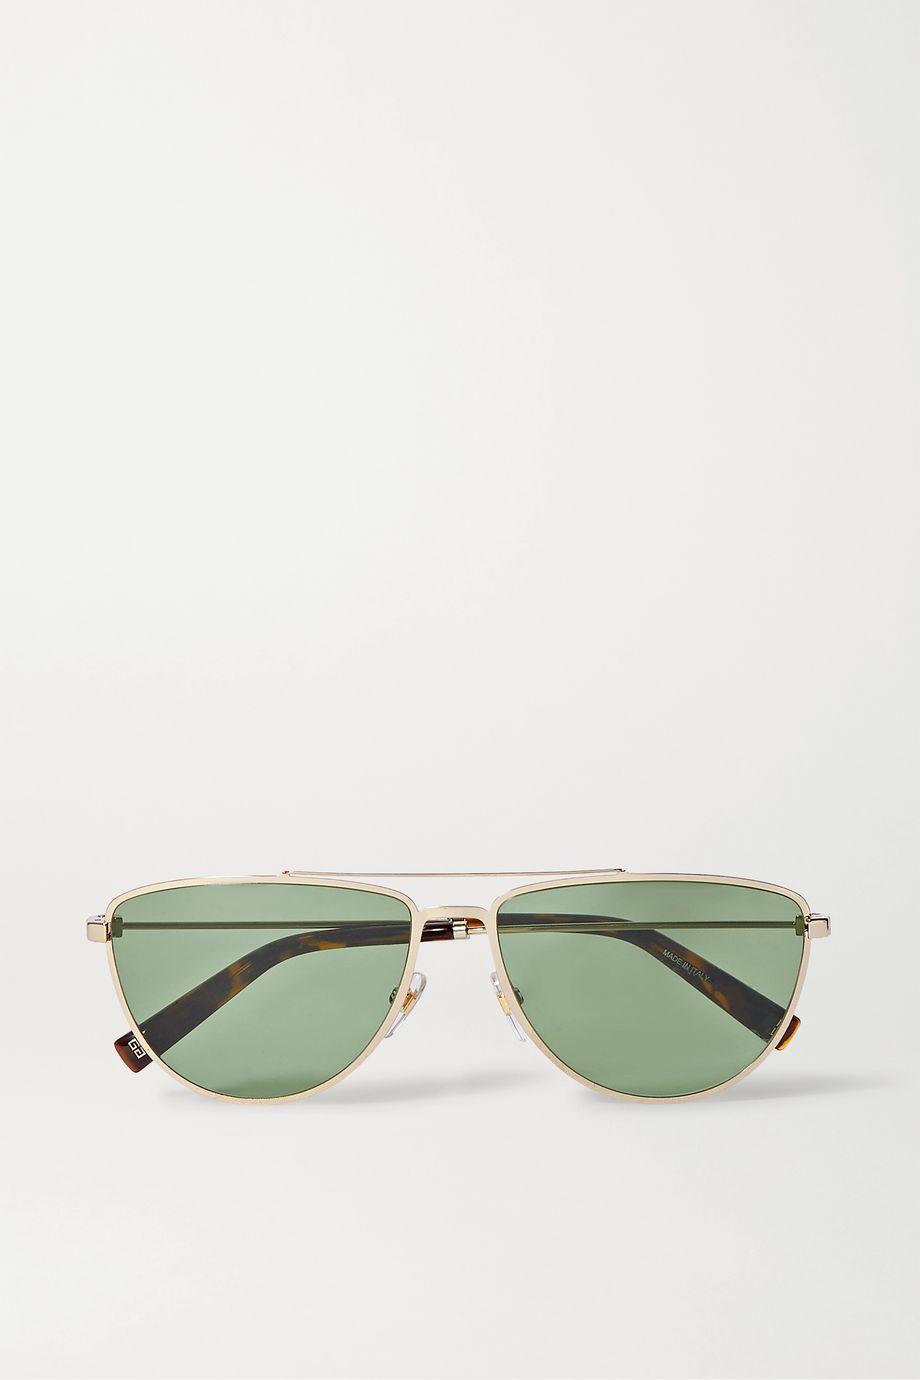 Givenchy Goldfarbene Pilotensonnenbrille aus Azetat in Hornoptik